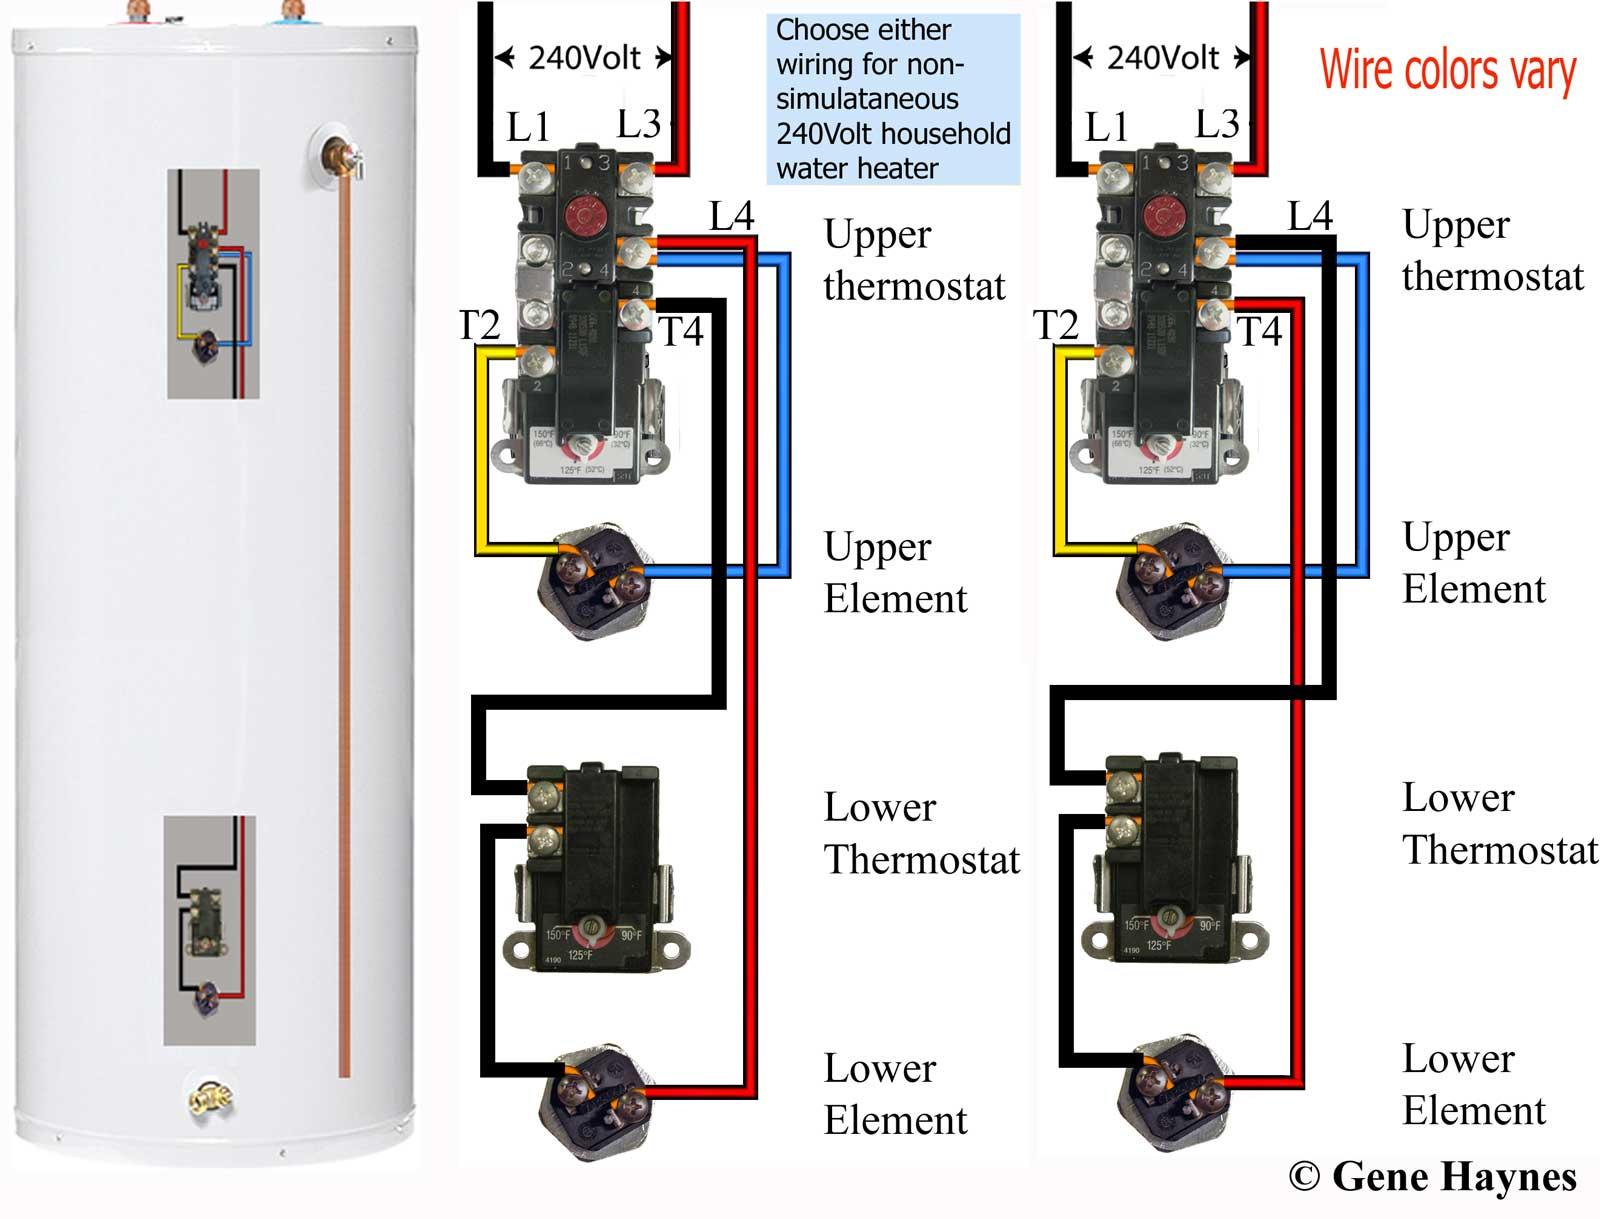 marvelous electric water heater wiring diagram rheem electric water Water Heater 240V Wiring-Diagram